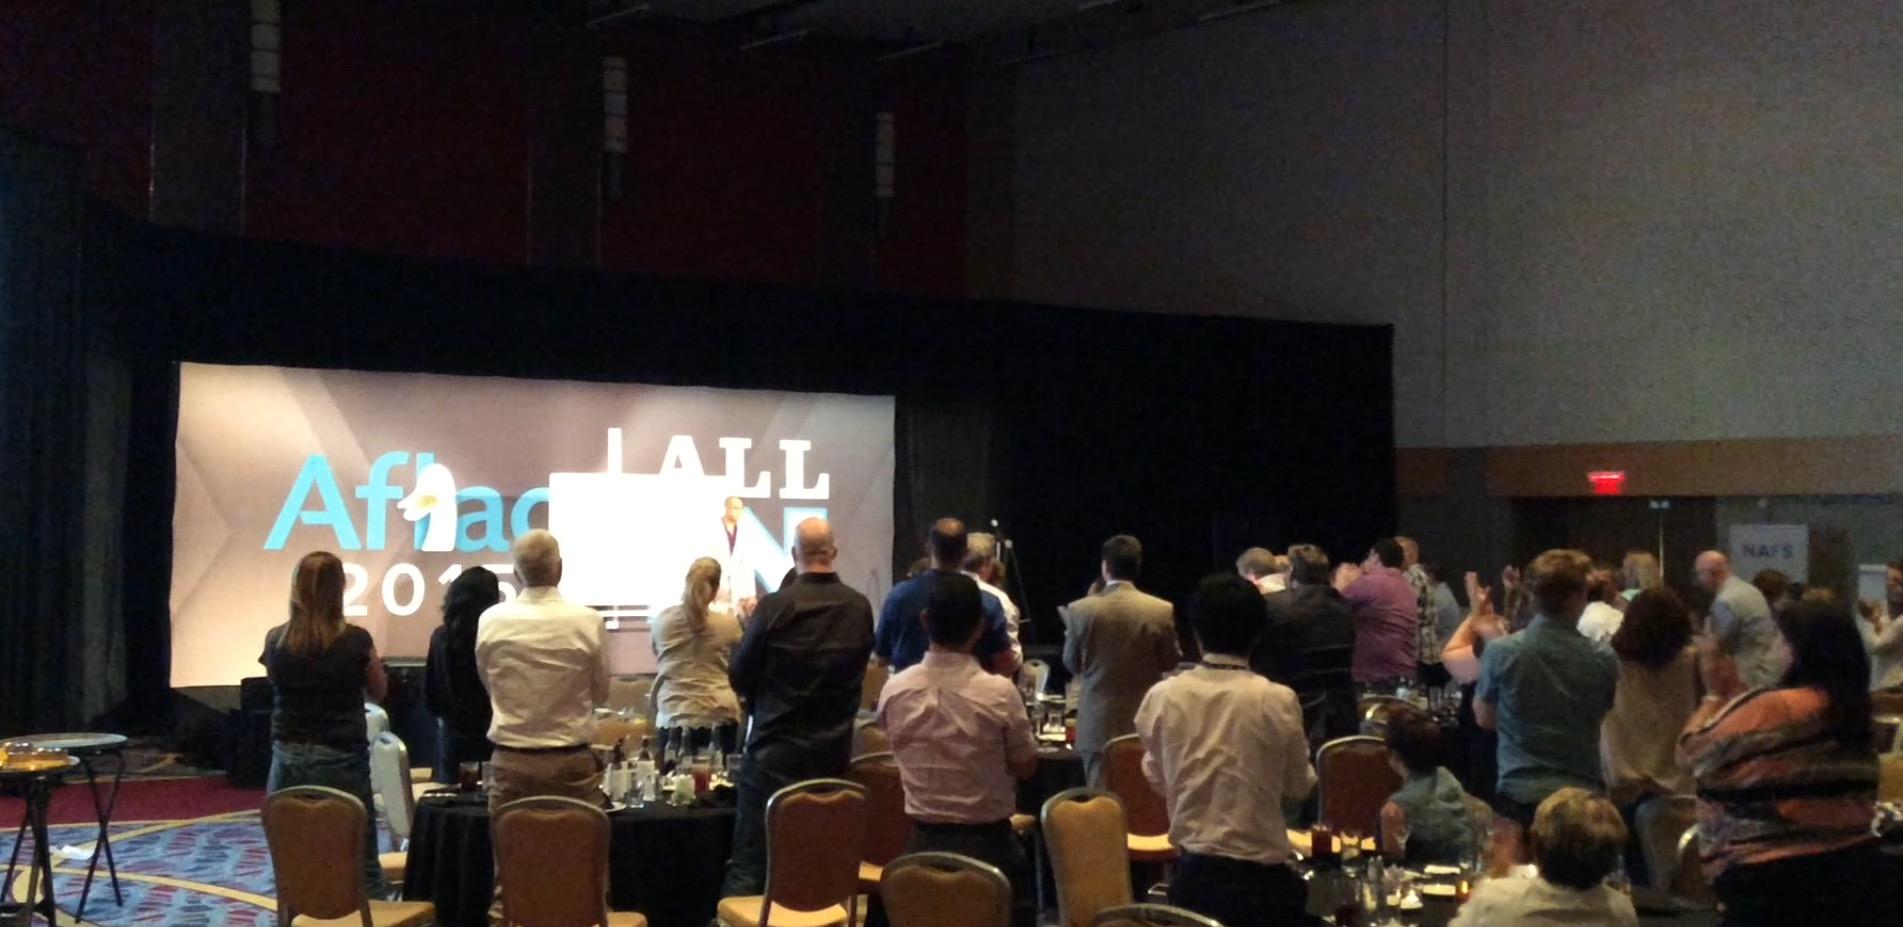 Benji Bruce keynote speaker standing ovation